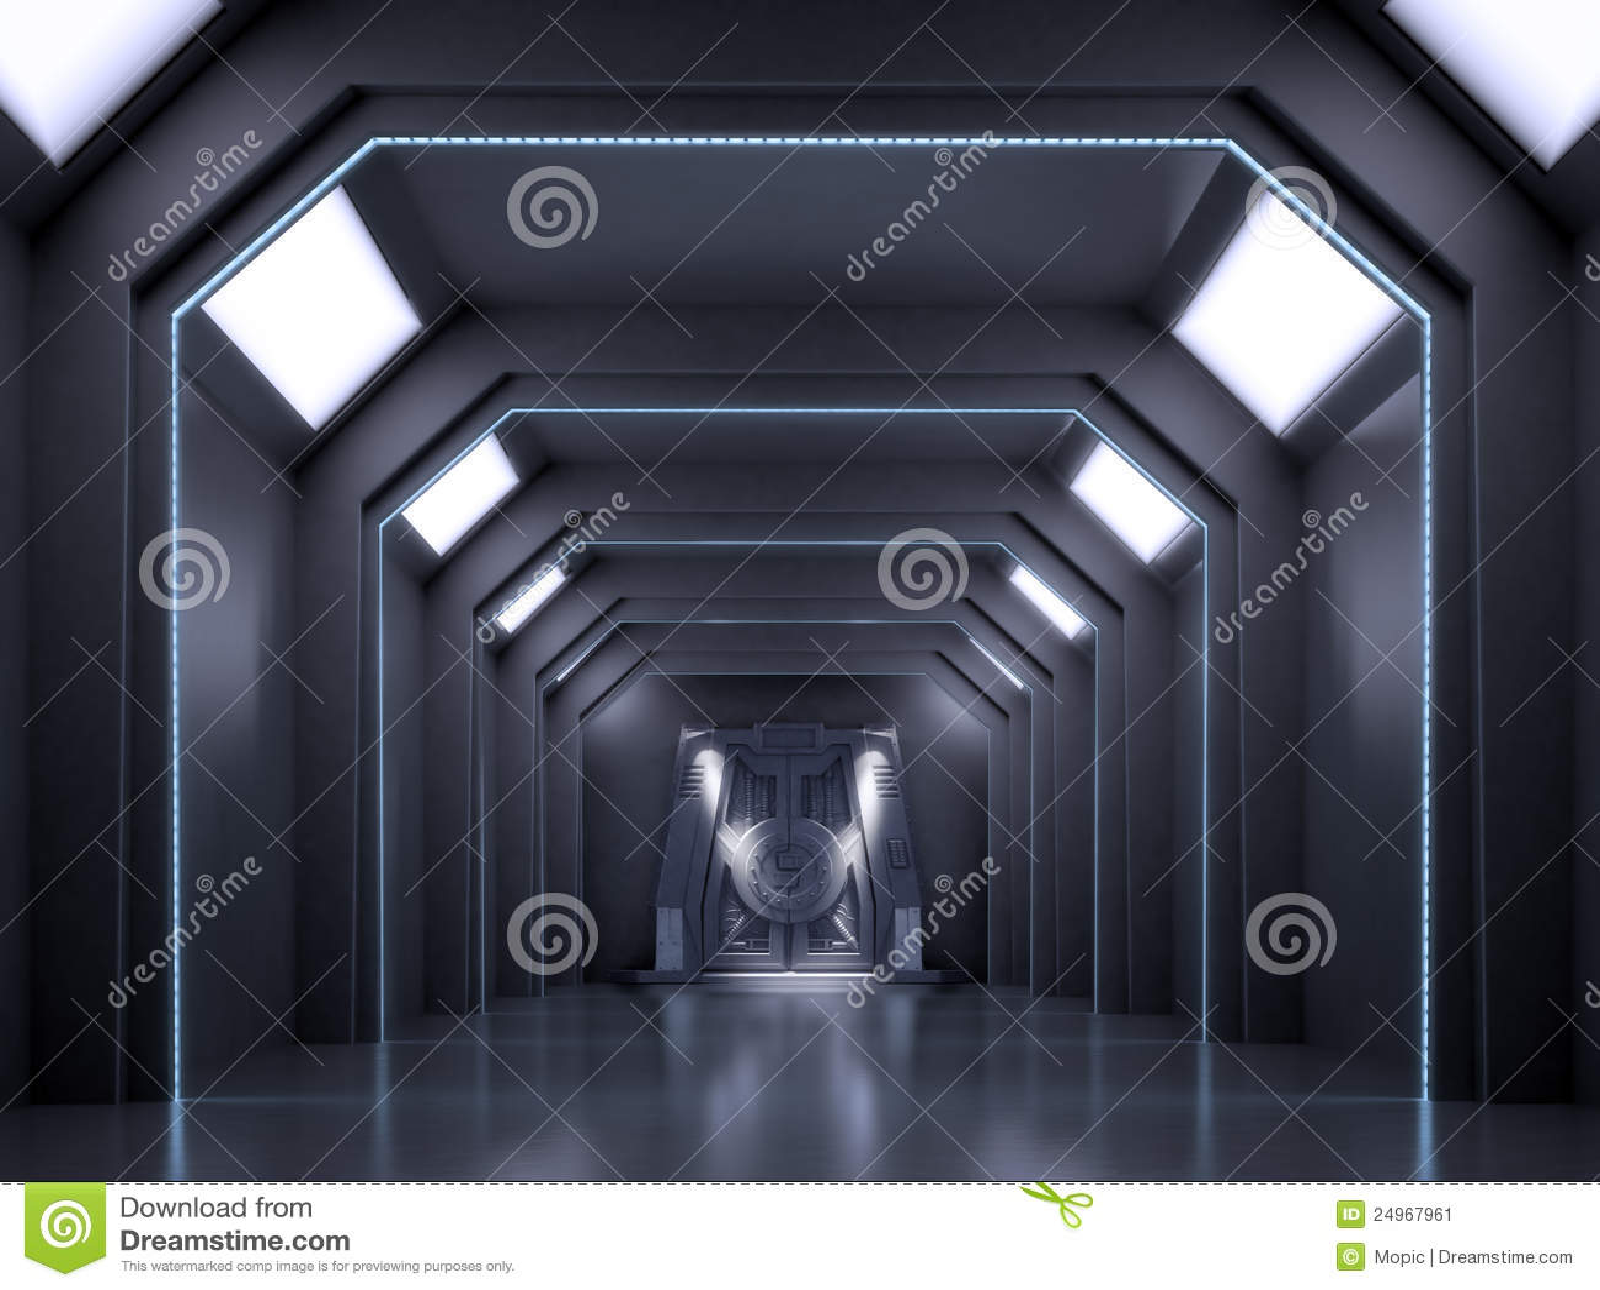 Science fiction interior scene